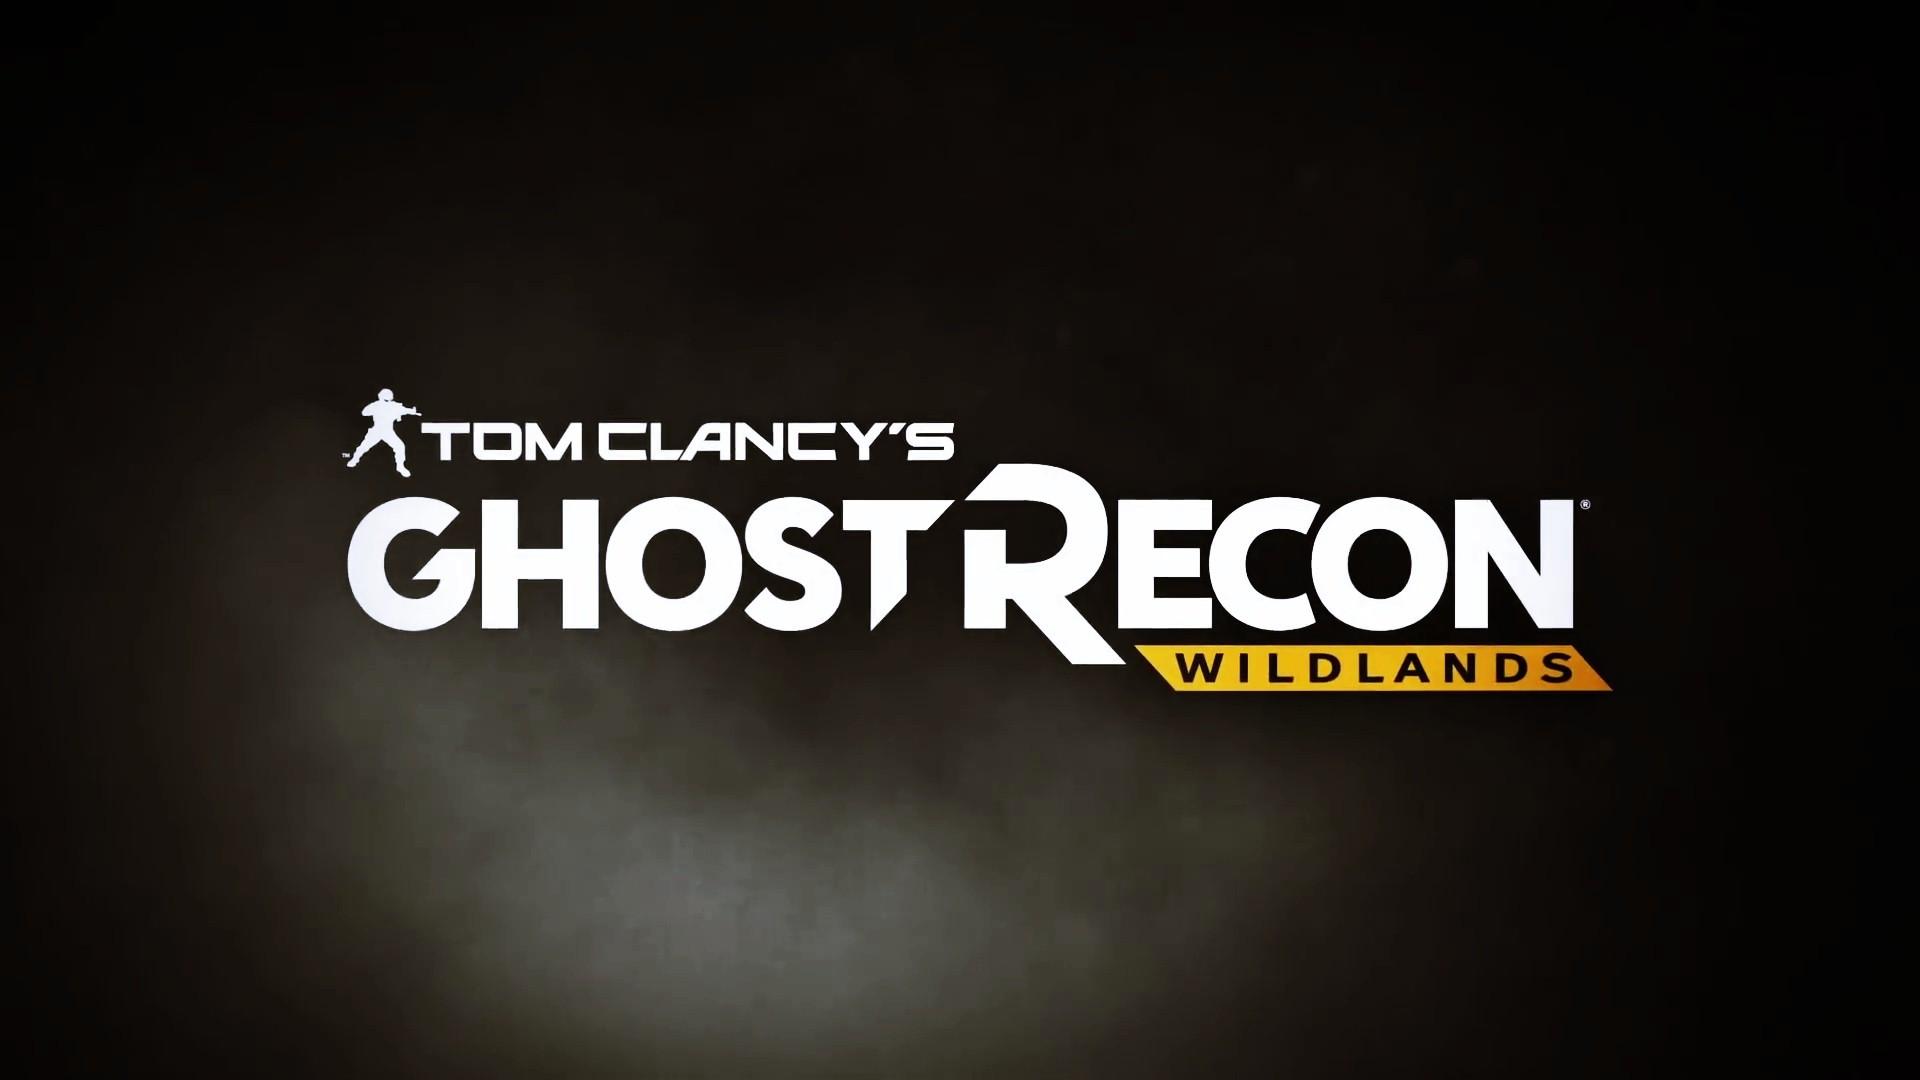 Tom Clancy's Ghost Recon Wildlands HD Wallpaper